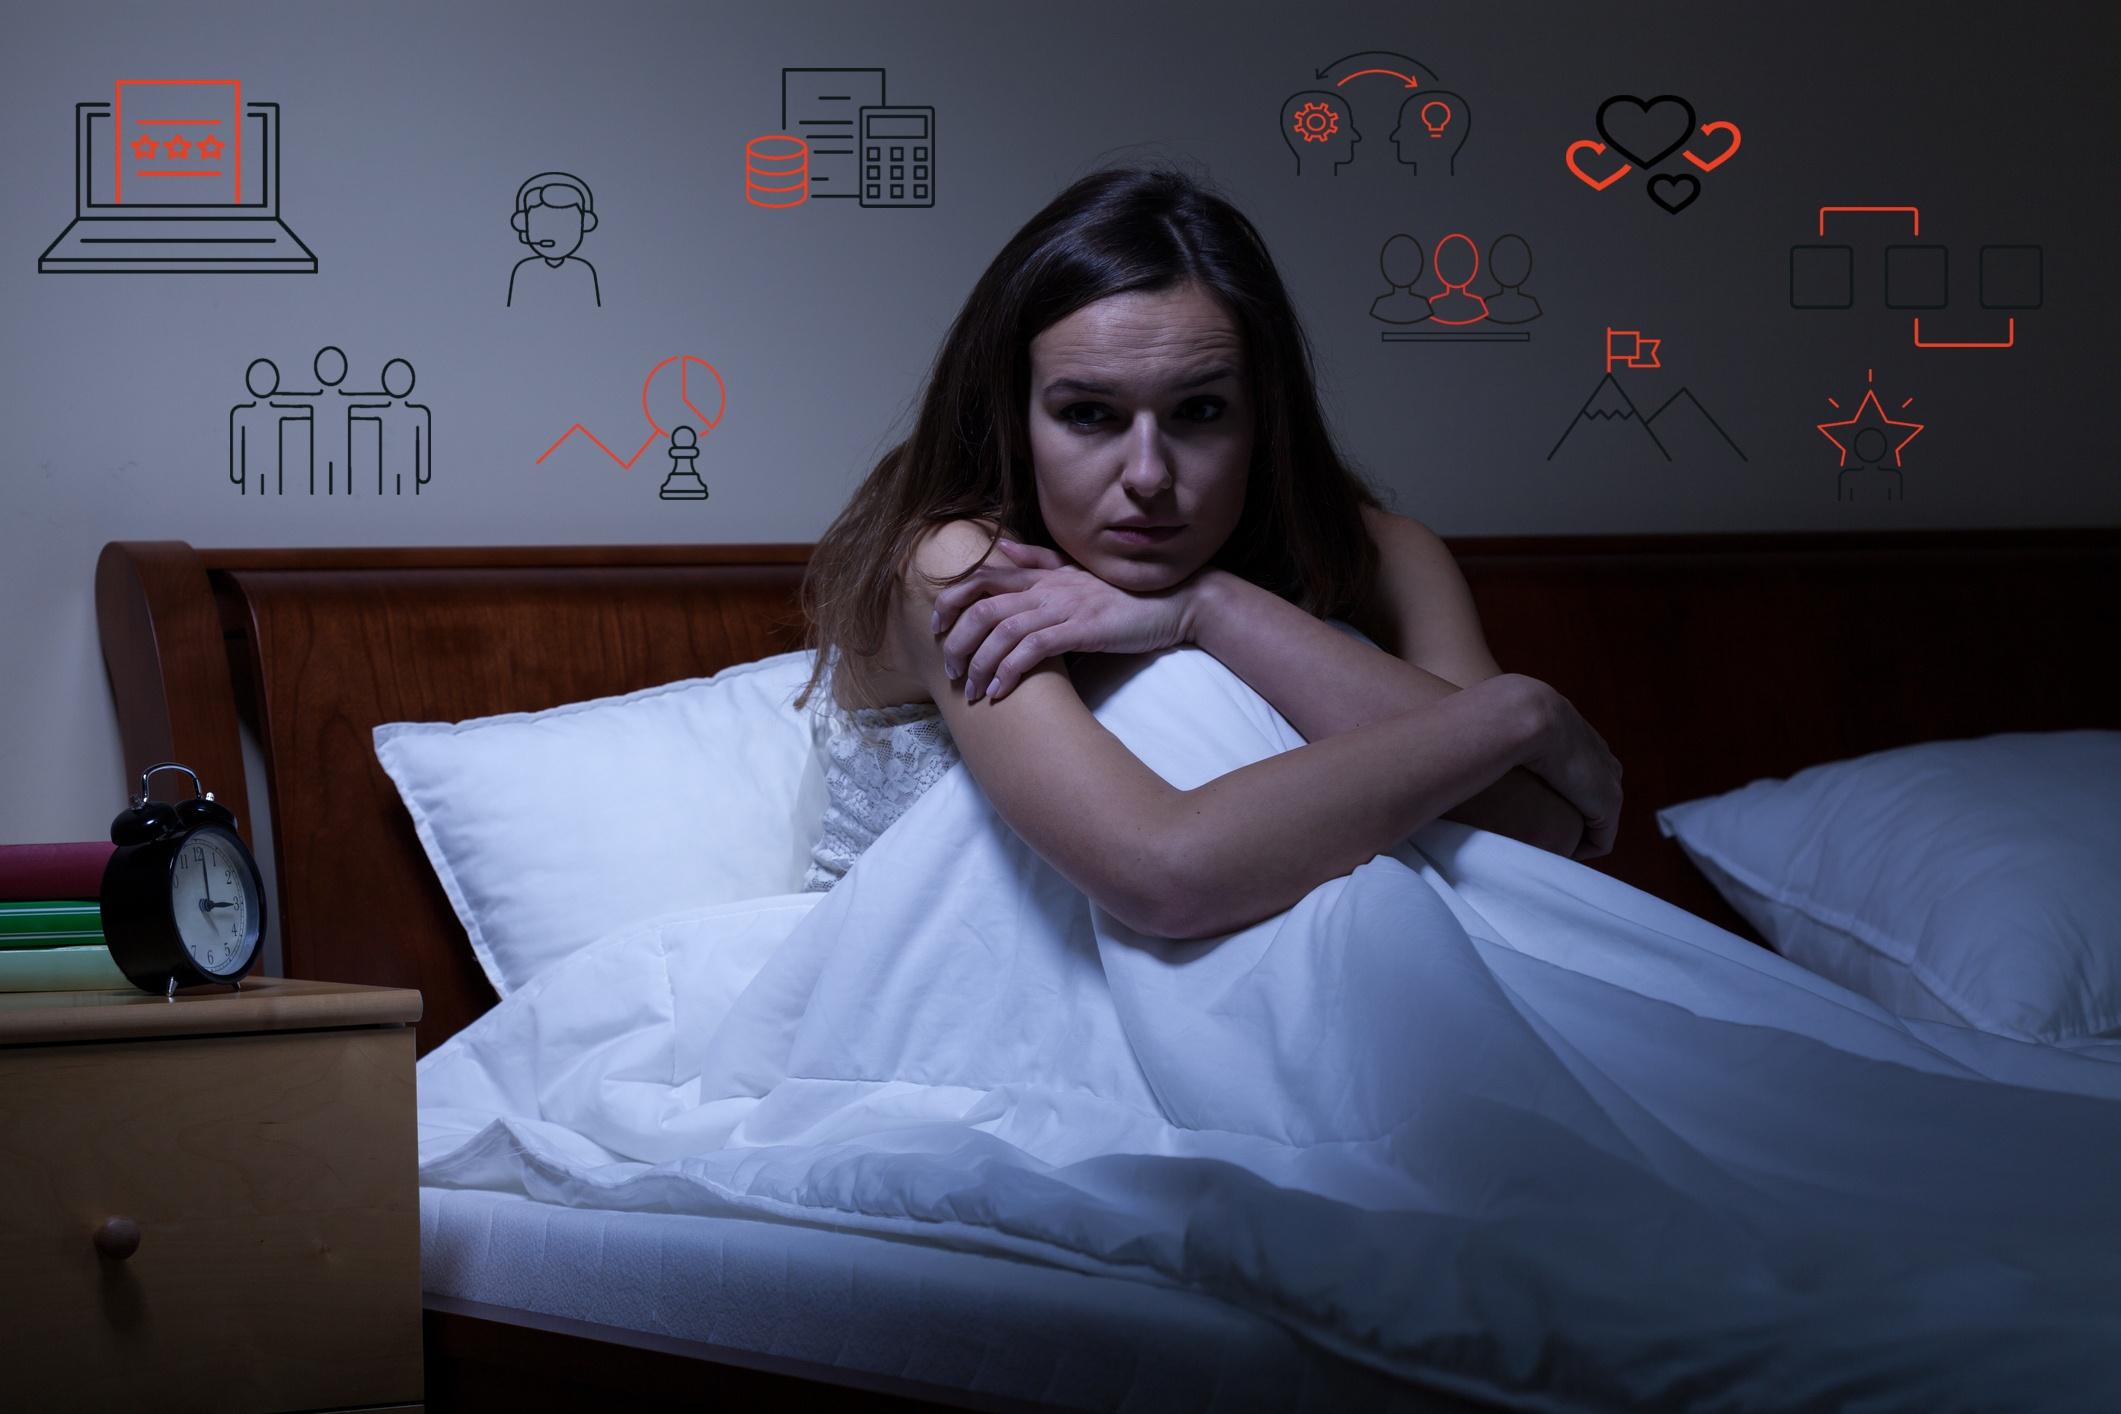 woman cant sleep at night merge ThinkstockPhotos various.jpg